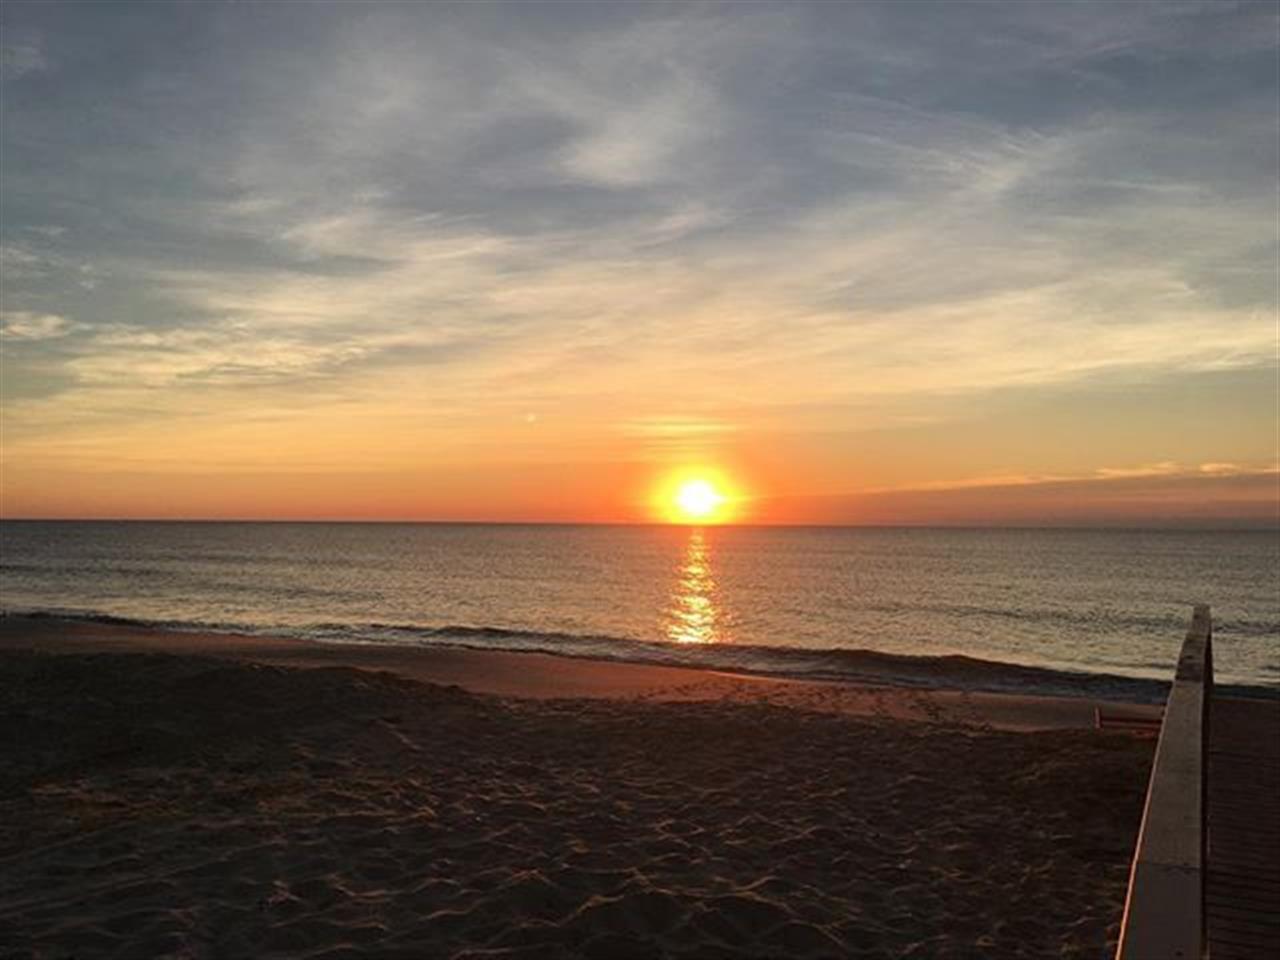 Good morning! #sunrise #nj  #goodmorning #jshn